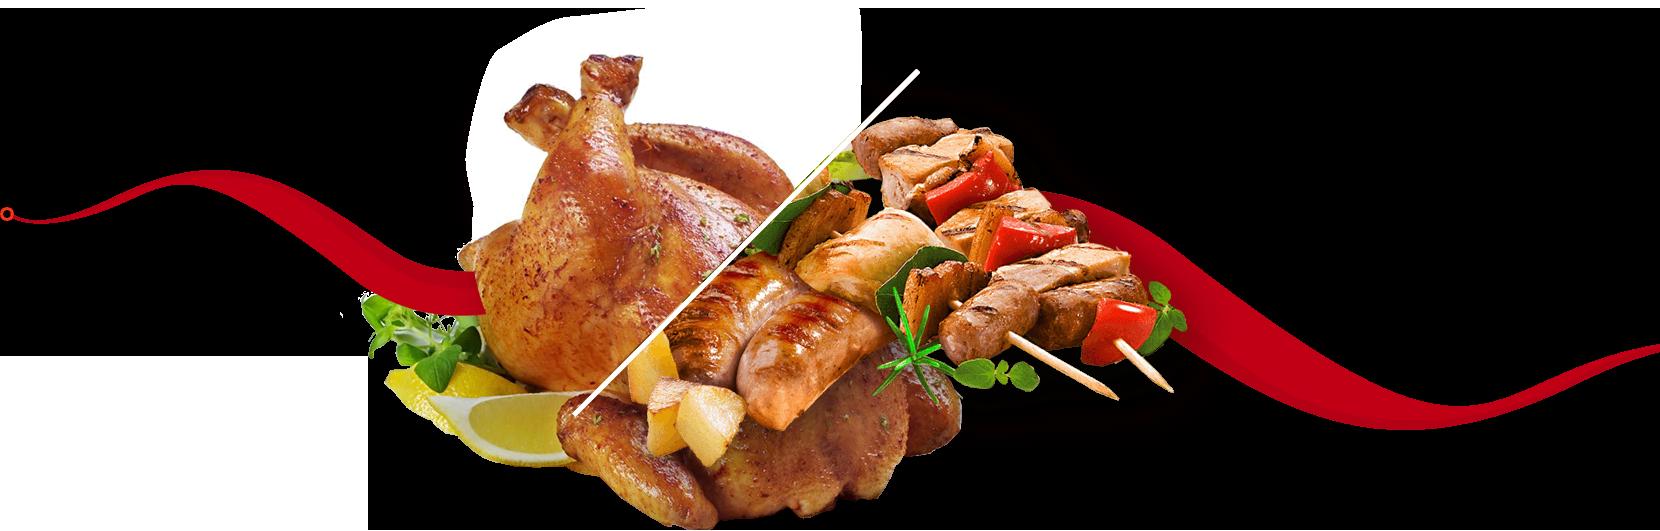 Meat clipart non veg food. Hi kolkata speciality bengali